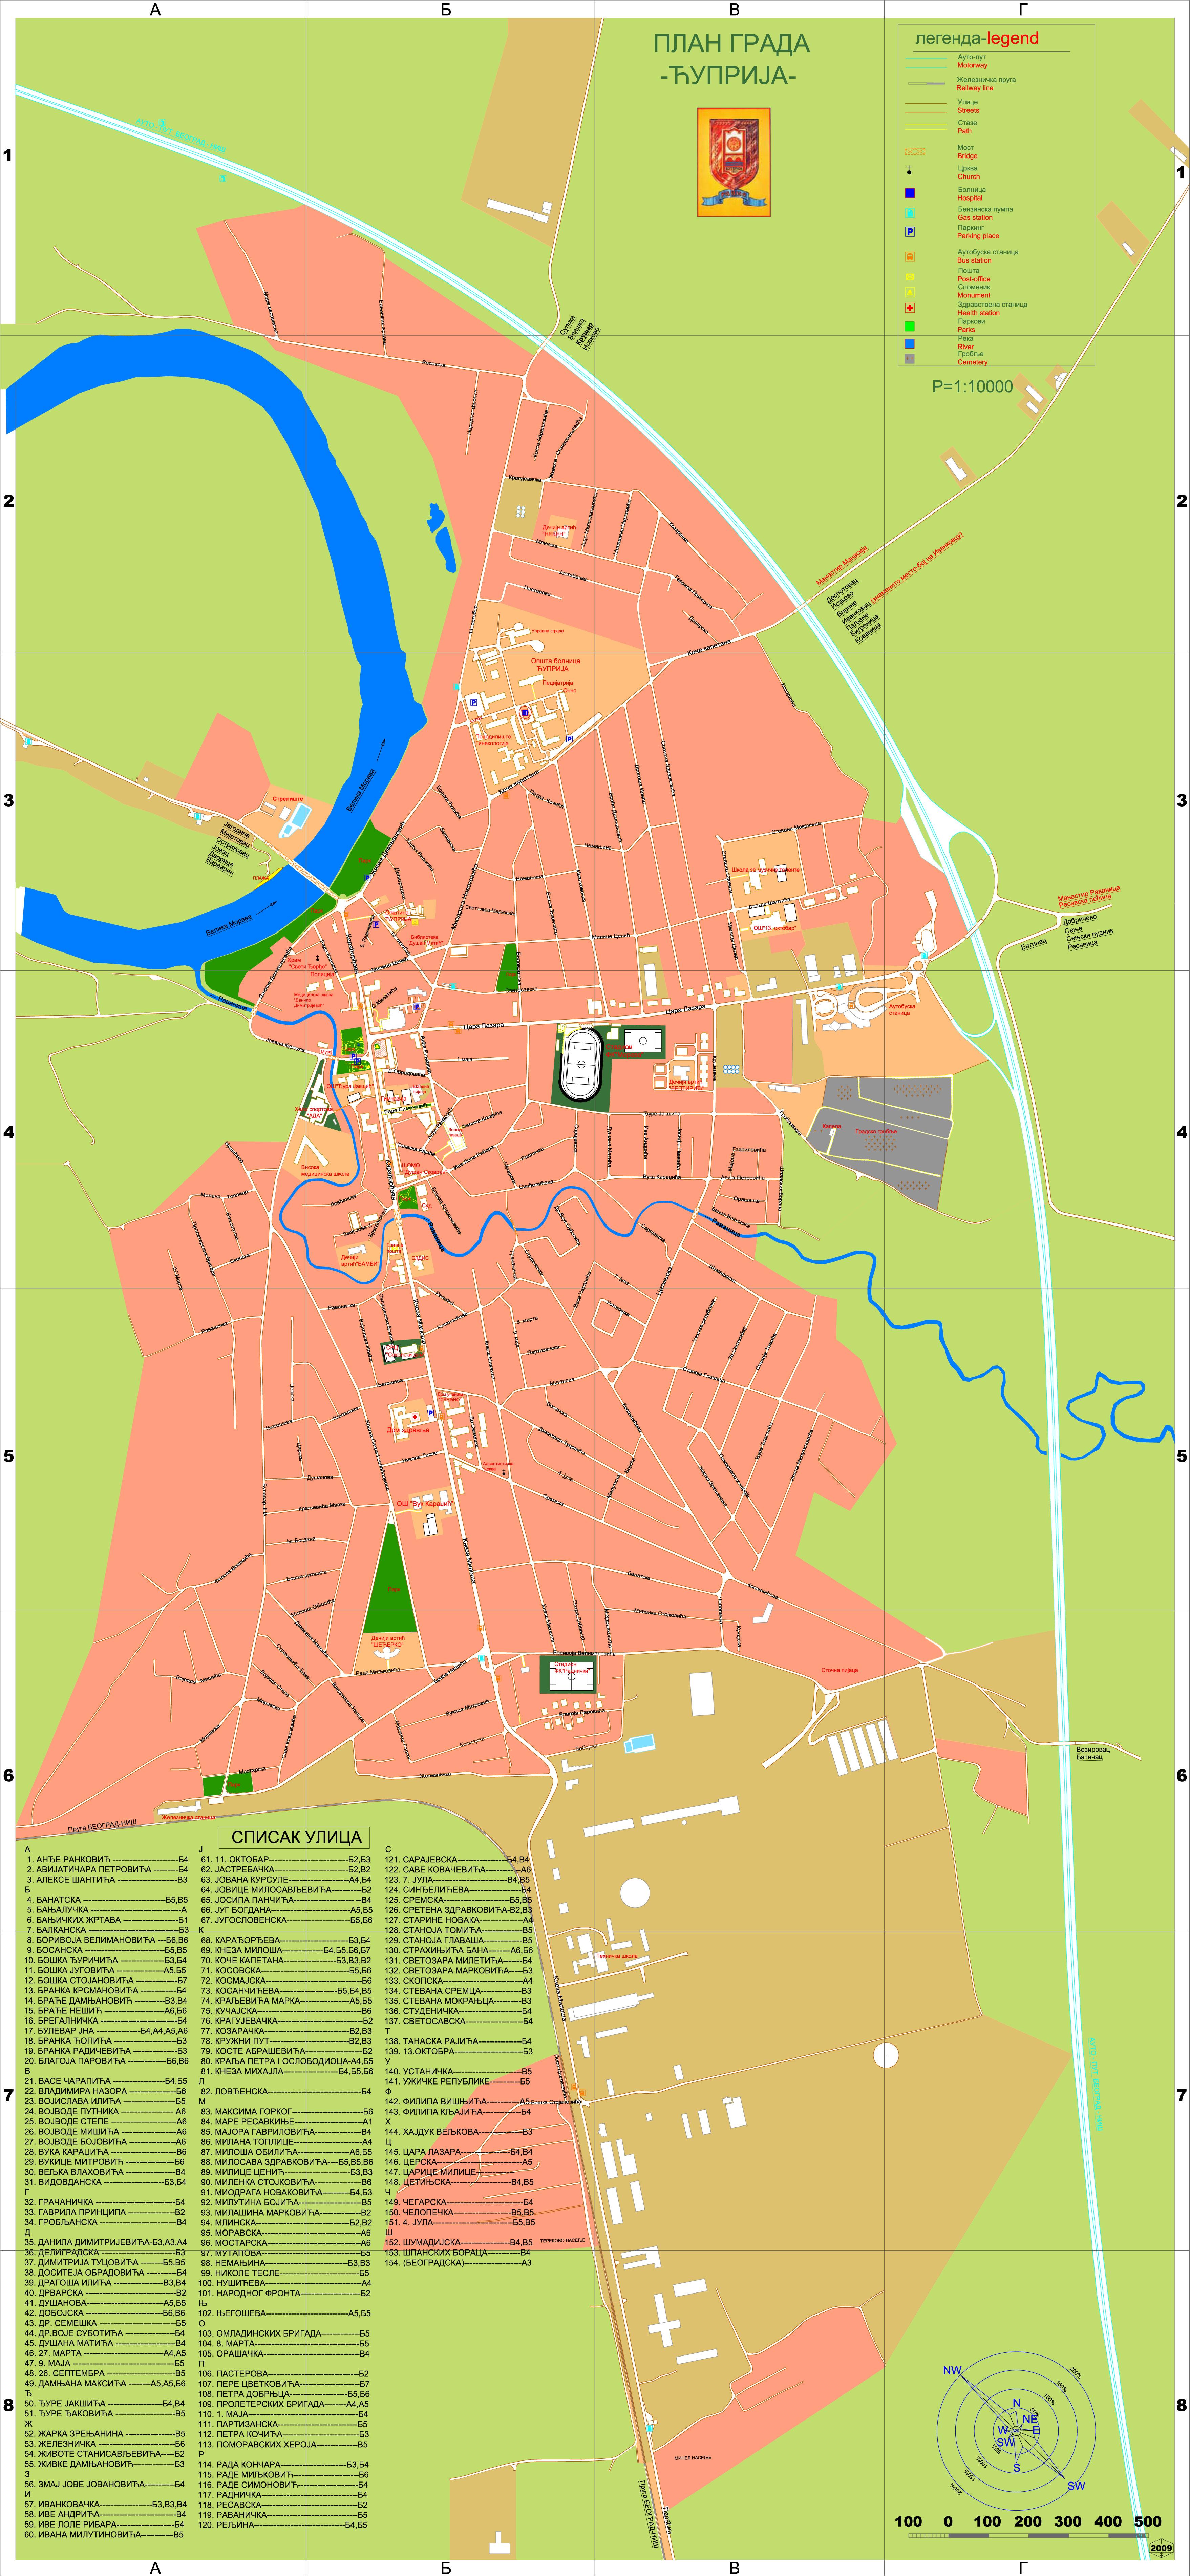 cuprija mapa Mapa Grada Cuprija cuprija mapa